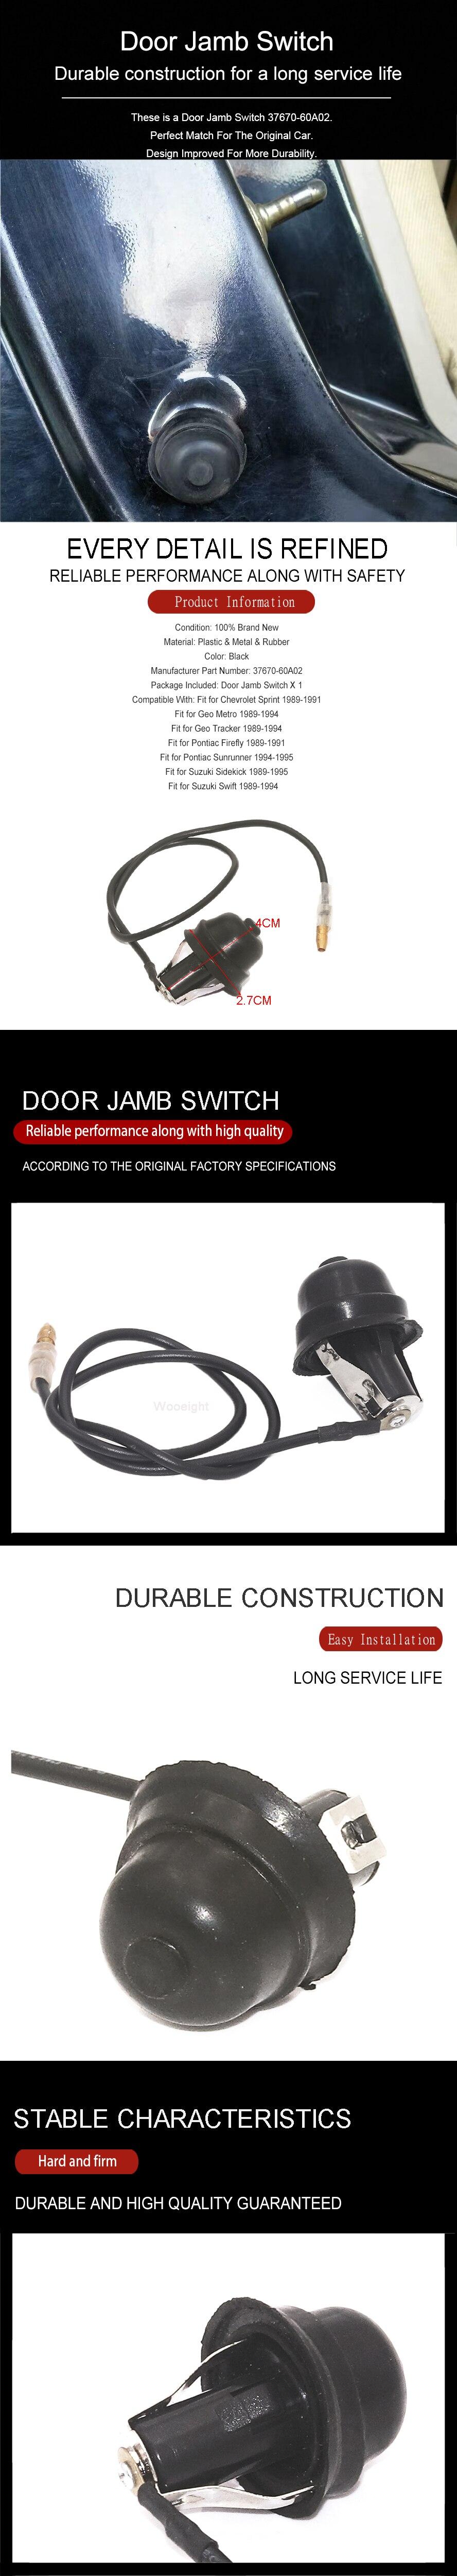 New Door Jamb Switch sensor Fit For Suzuki Swift Sidekick Geo Metro Tracker Pontiac Firefly Chevrolet Sprint 37670-60A02